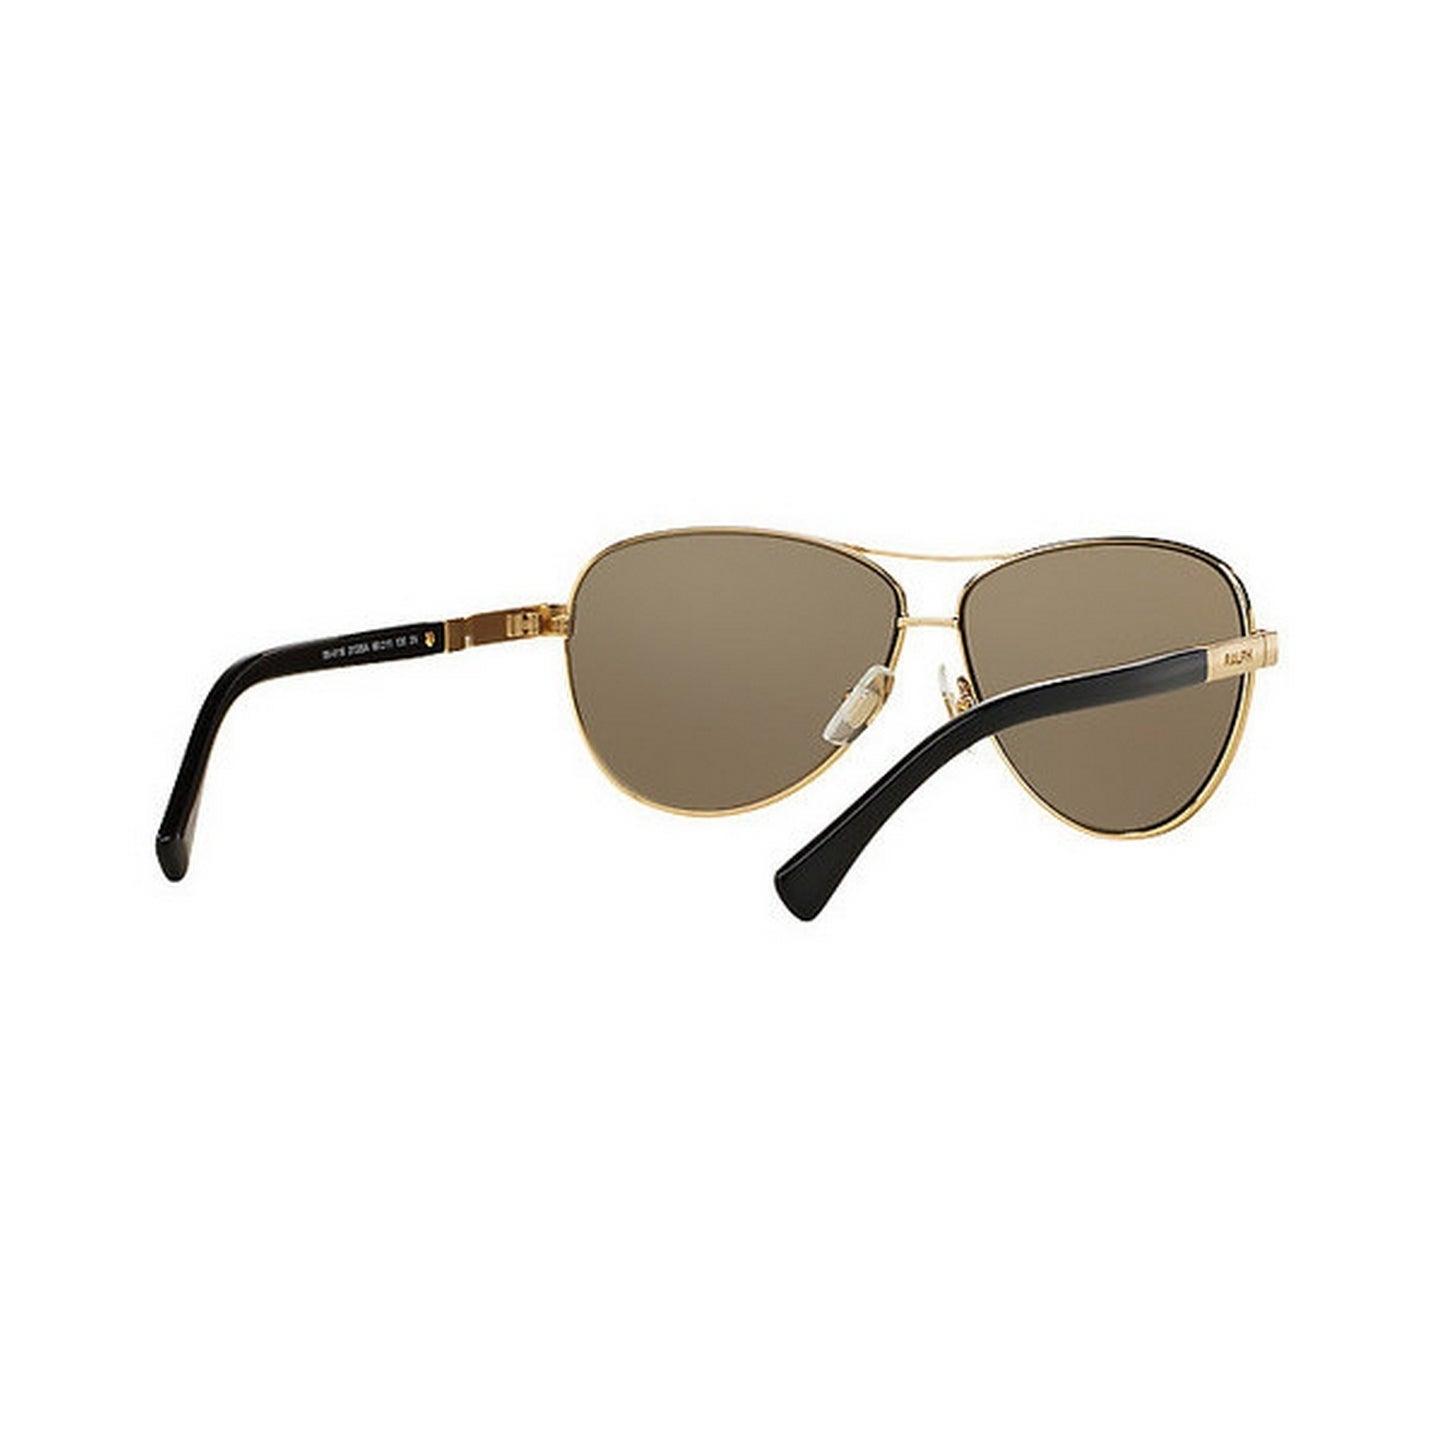 654650d09dd Shop Ralph by Ralph Lauren Women s RA4116 31335A 60 Aviator Metal Plastic  Gold Brown Sunglasses - Free Shipping Today - Overstock - 14692982